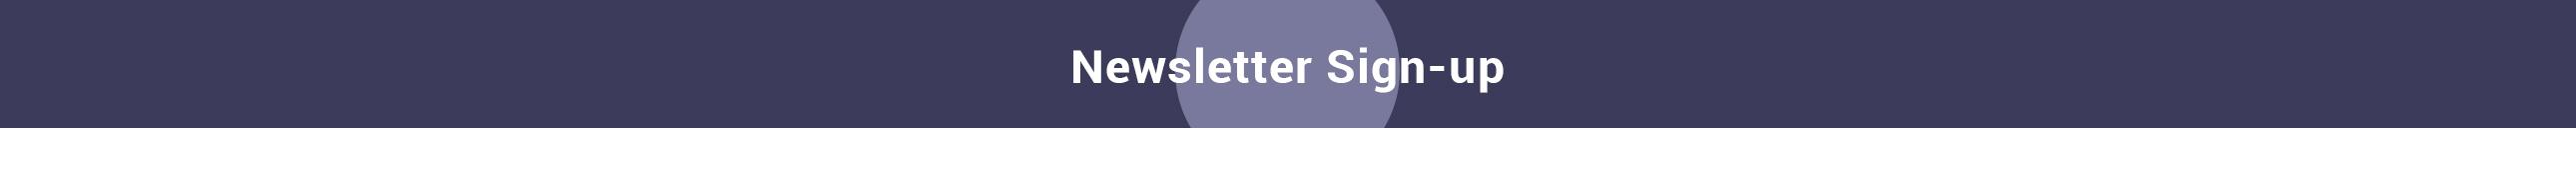 Meloxidyl_Content-Sliders-Newsletter